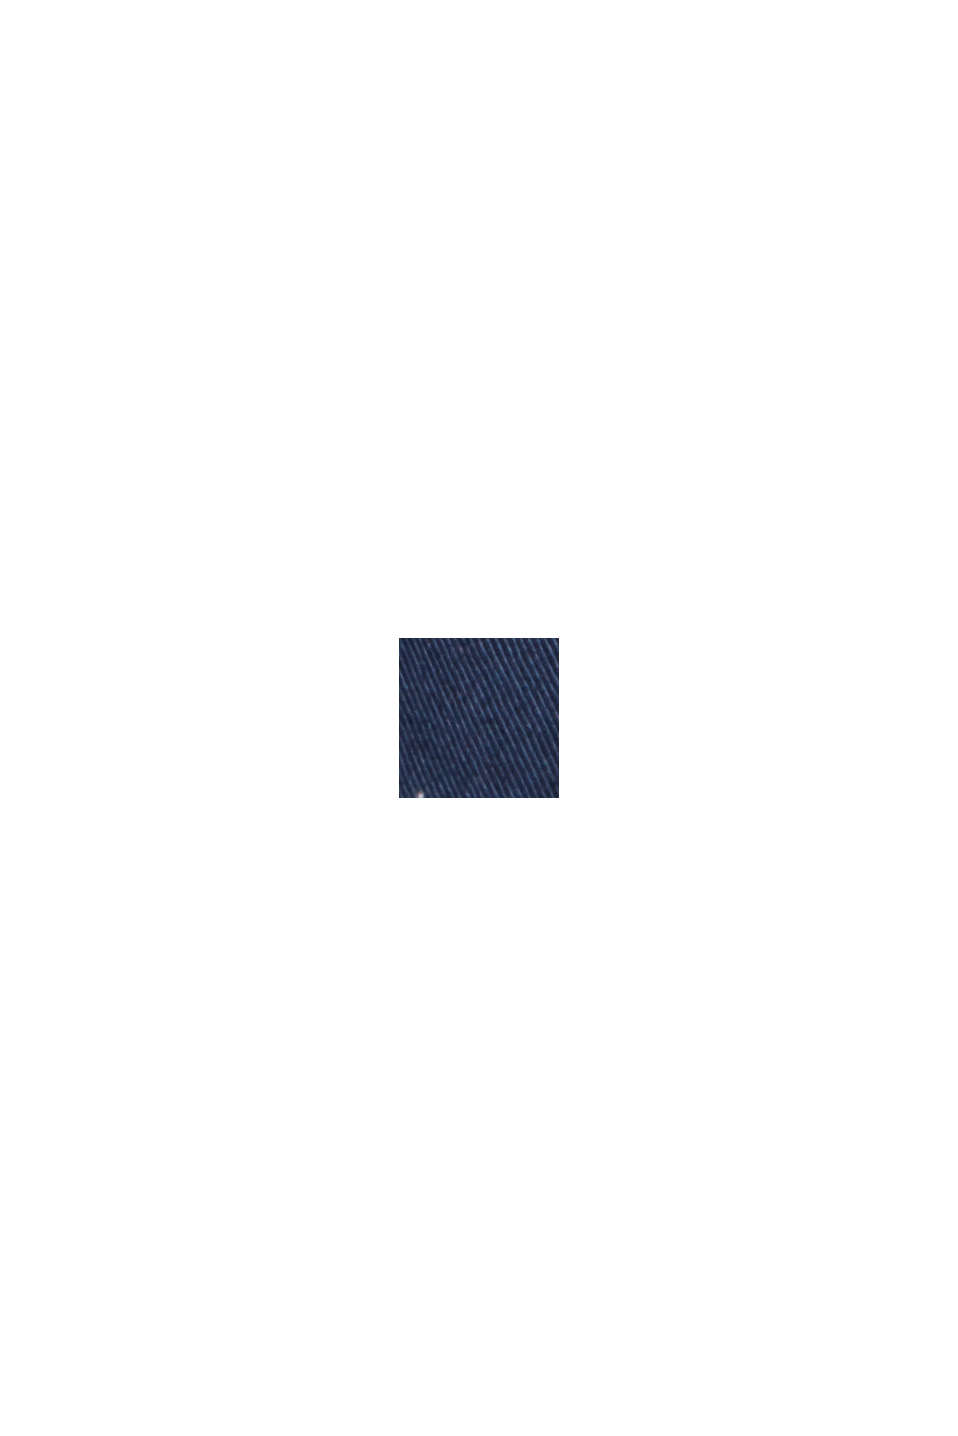 Pull-over en maille côtelée 100% coton, NAVY, swatch